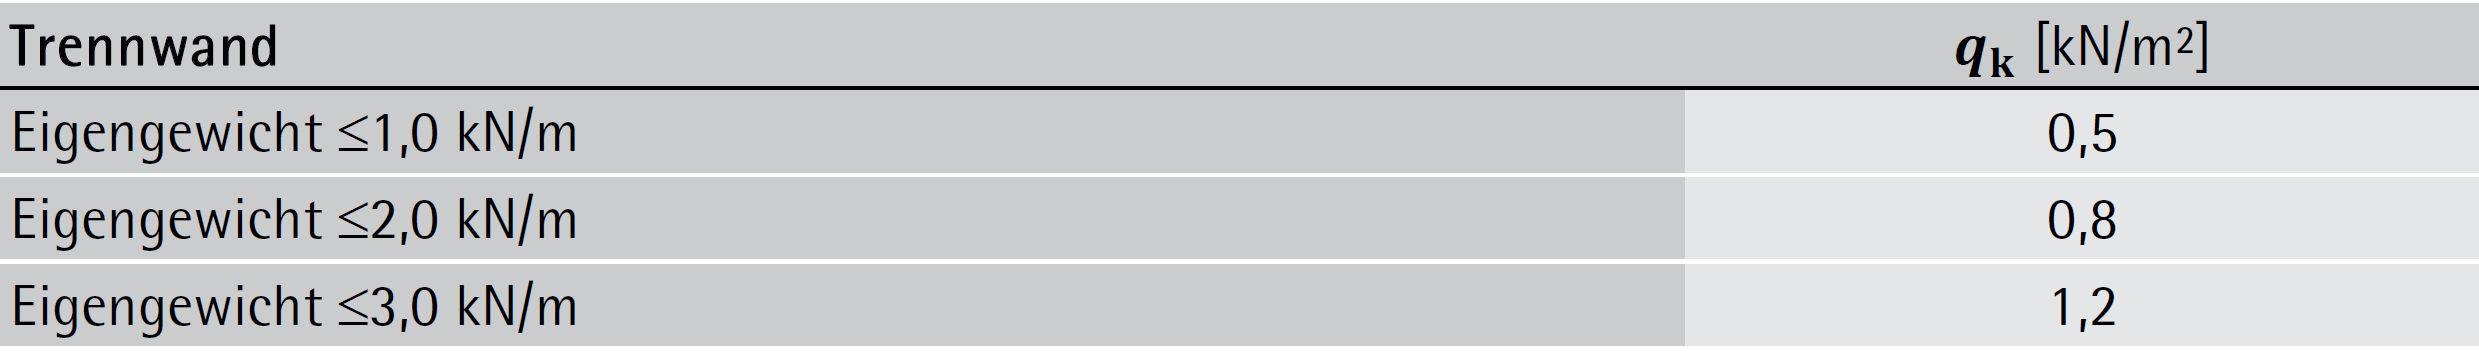 Nutzlastzuschlag versetzbarer Trennwände – ÖNORM B 1991-1-1